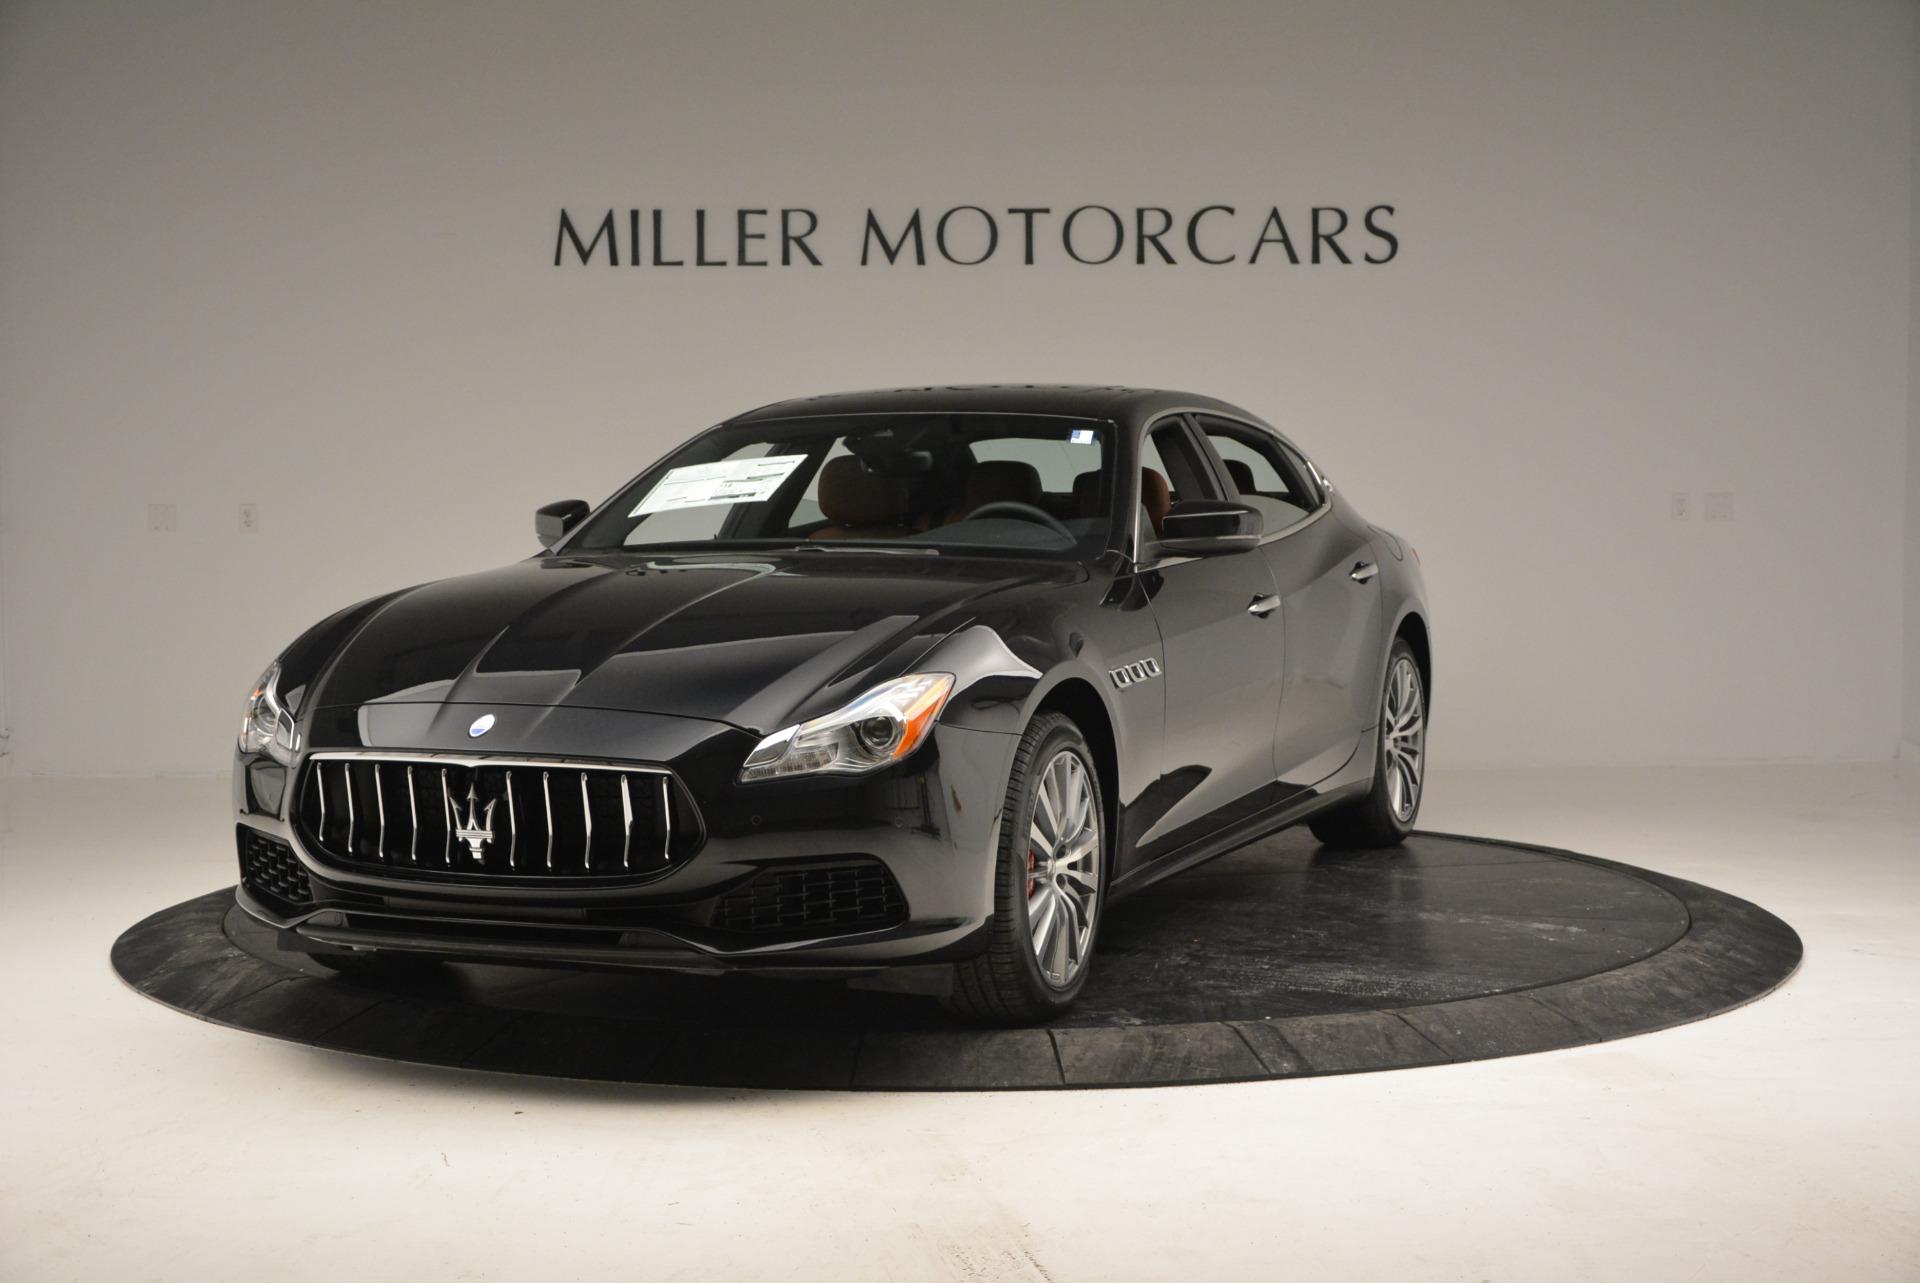 New 2017 Maserati Quattroporte S Q4 For Sale In Westport, CT 690_main